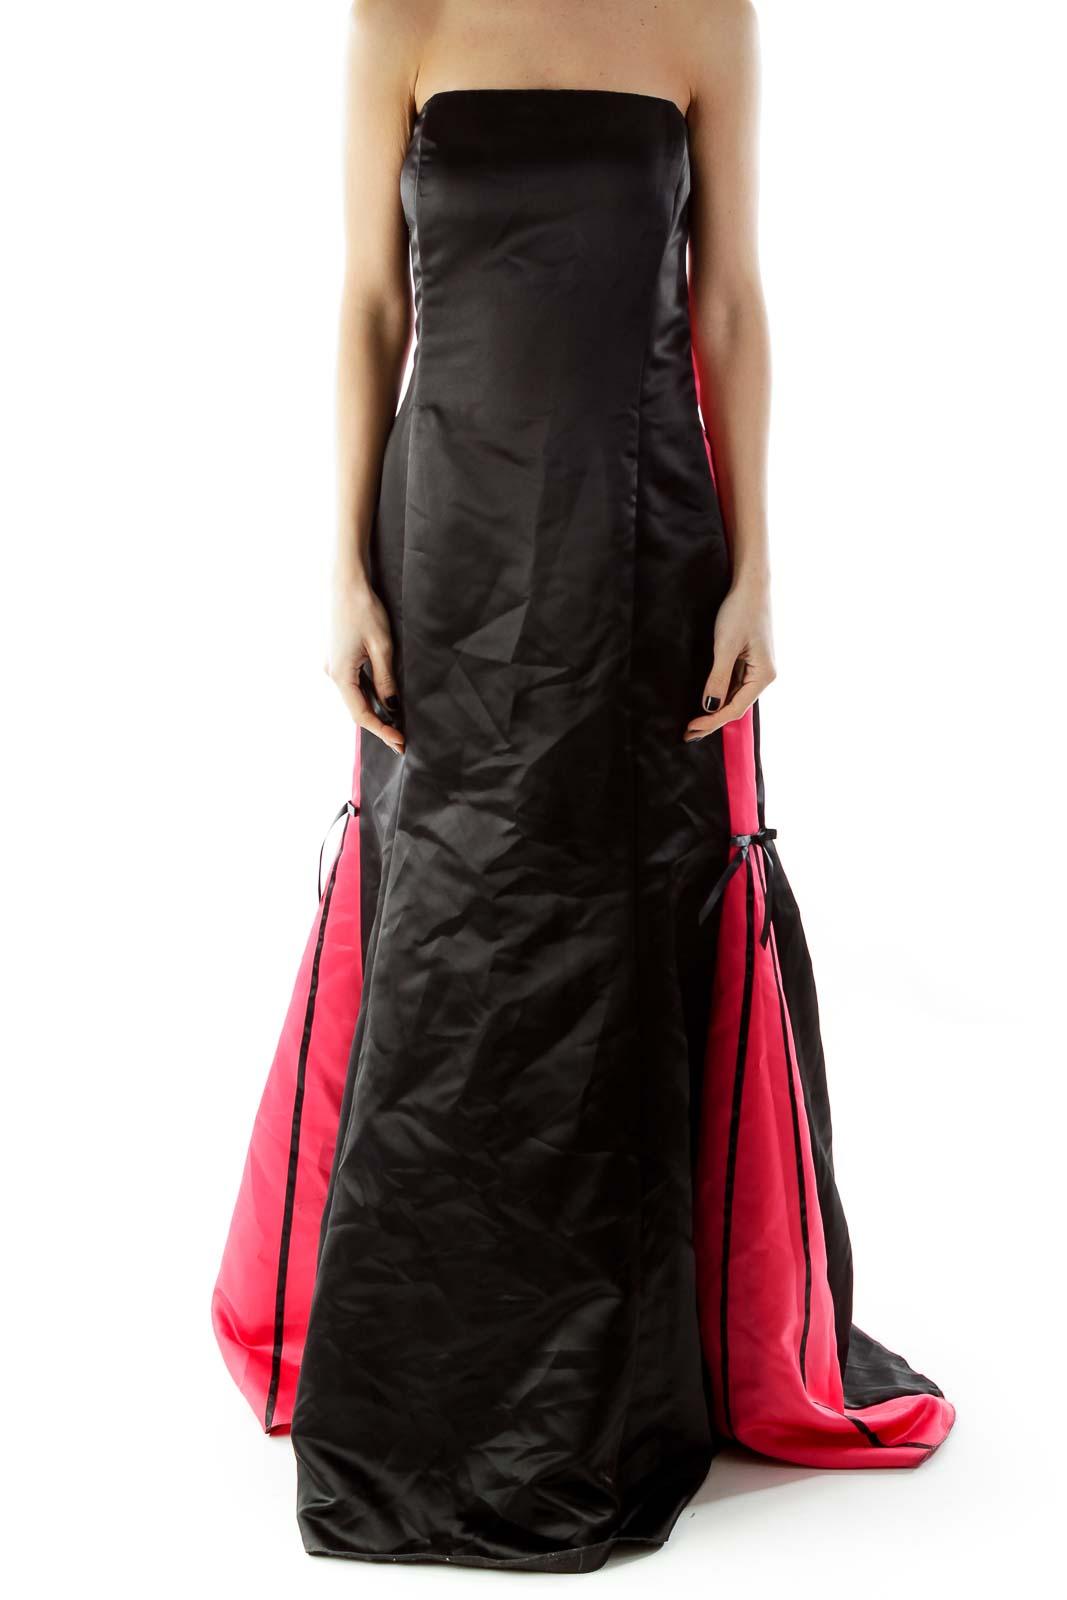 Shop Jessica McClintock clothing and handbags at SilkRoll. Trade ...